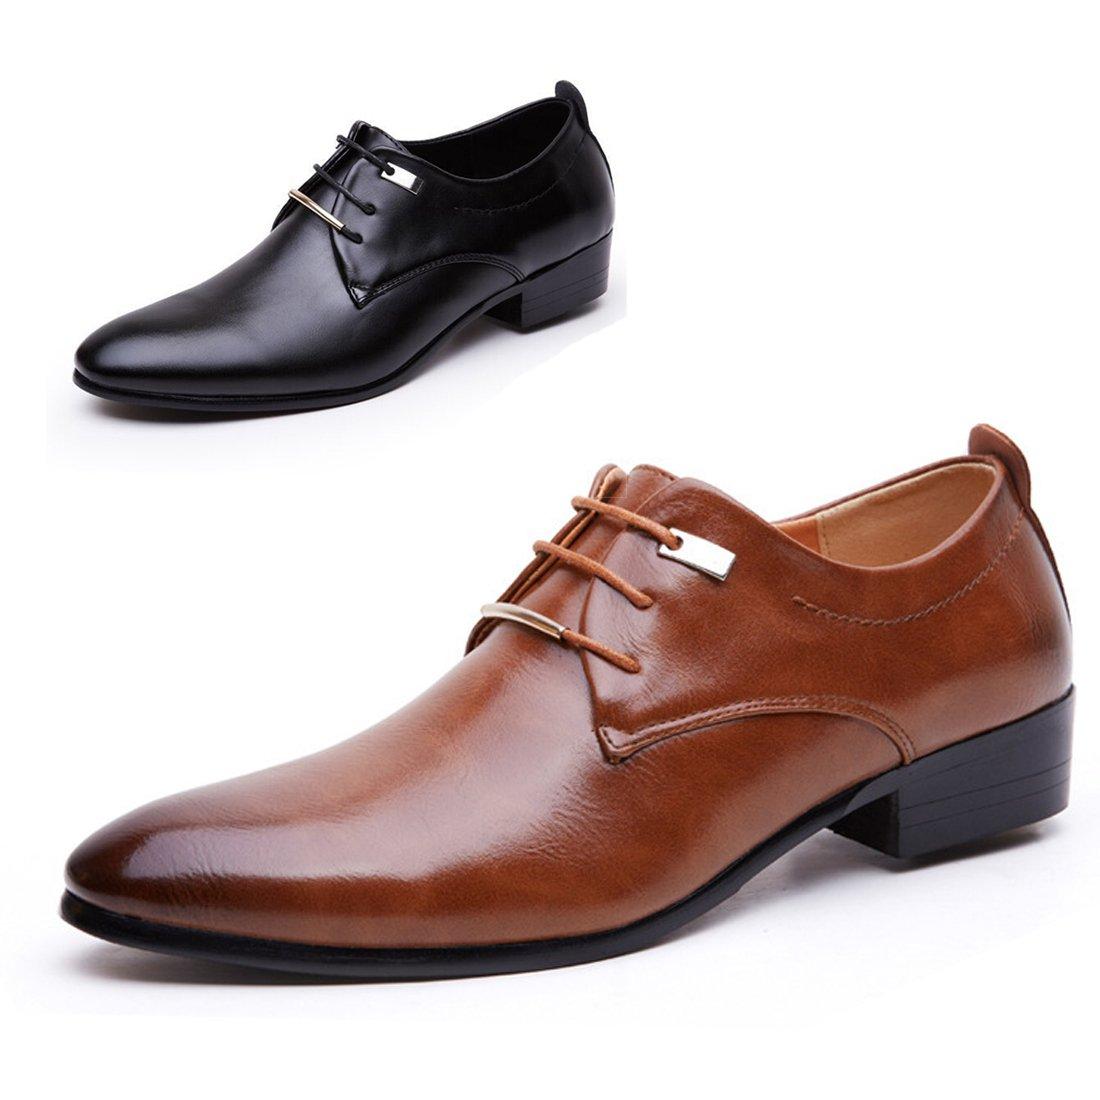 13d3dcf14c425 Amazon.com: Gaorui Men Pointed Toe Business Dress Formal Leather ...